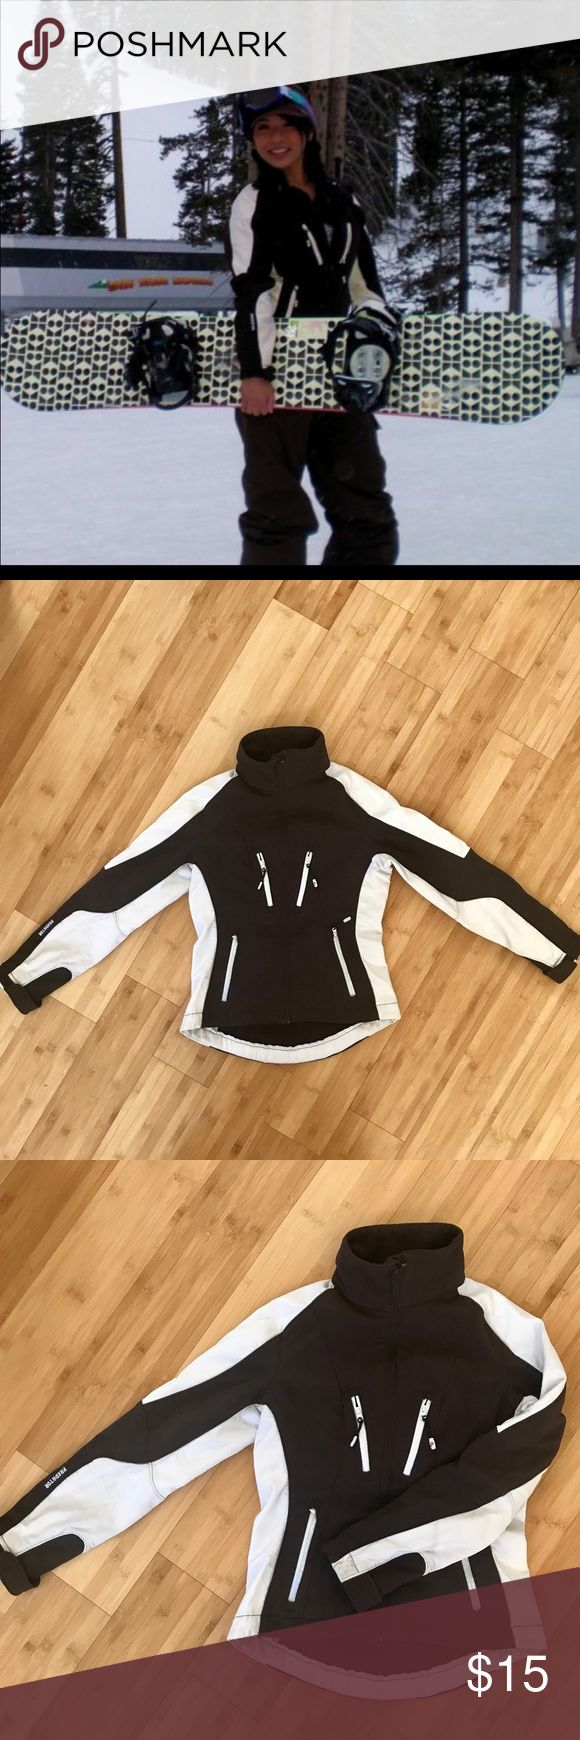 Waterproof snowboard jacket Lightly use snowboard jacket, light and comfortable. Predator brown/ Ivory Fleece Lined Hooded Waterproof Jacket predator Jackets & Coats Utility Jackets